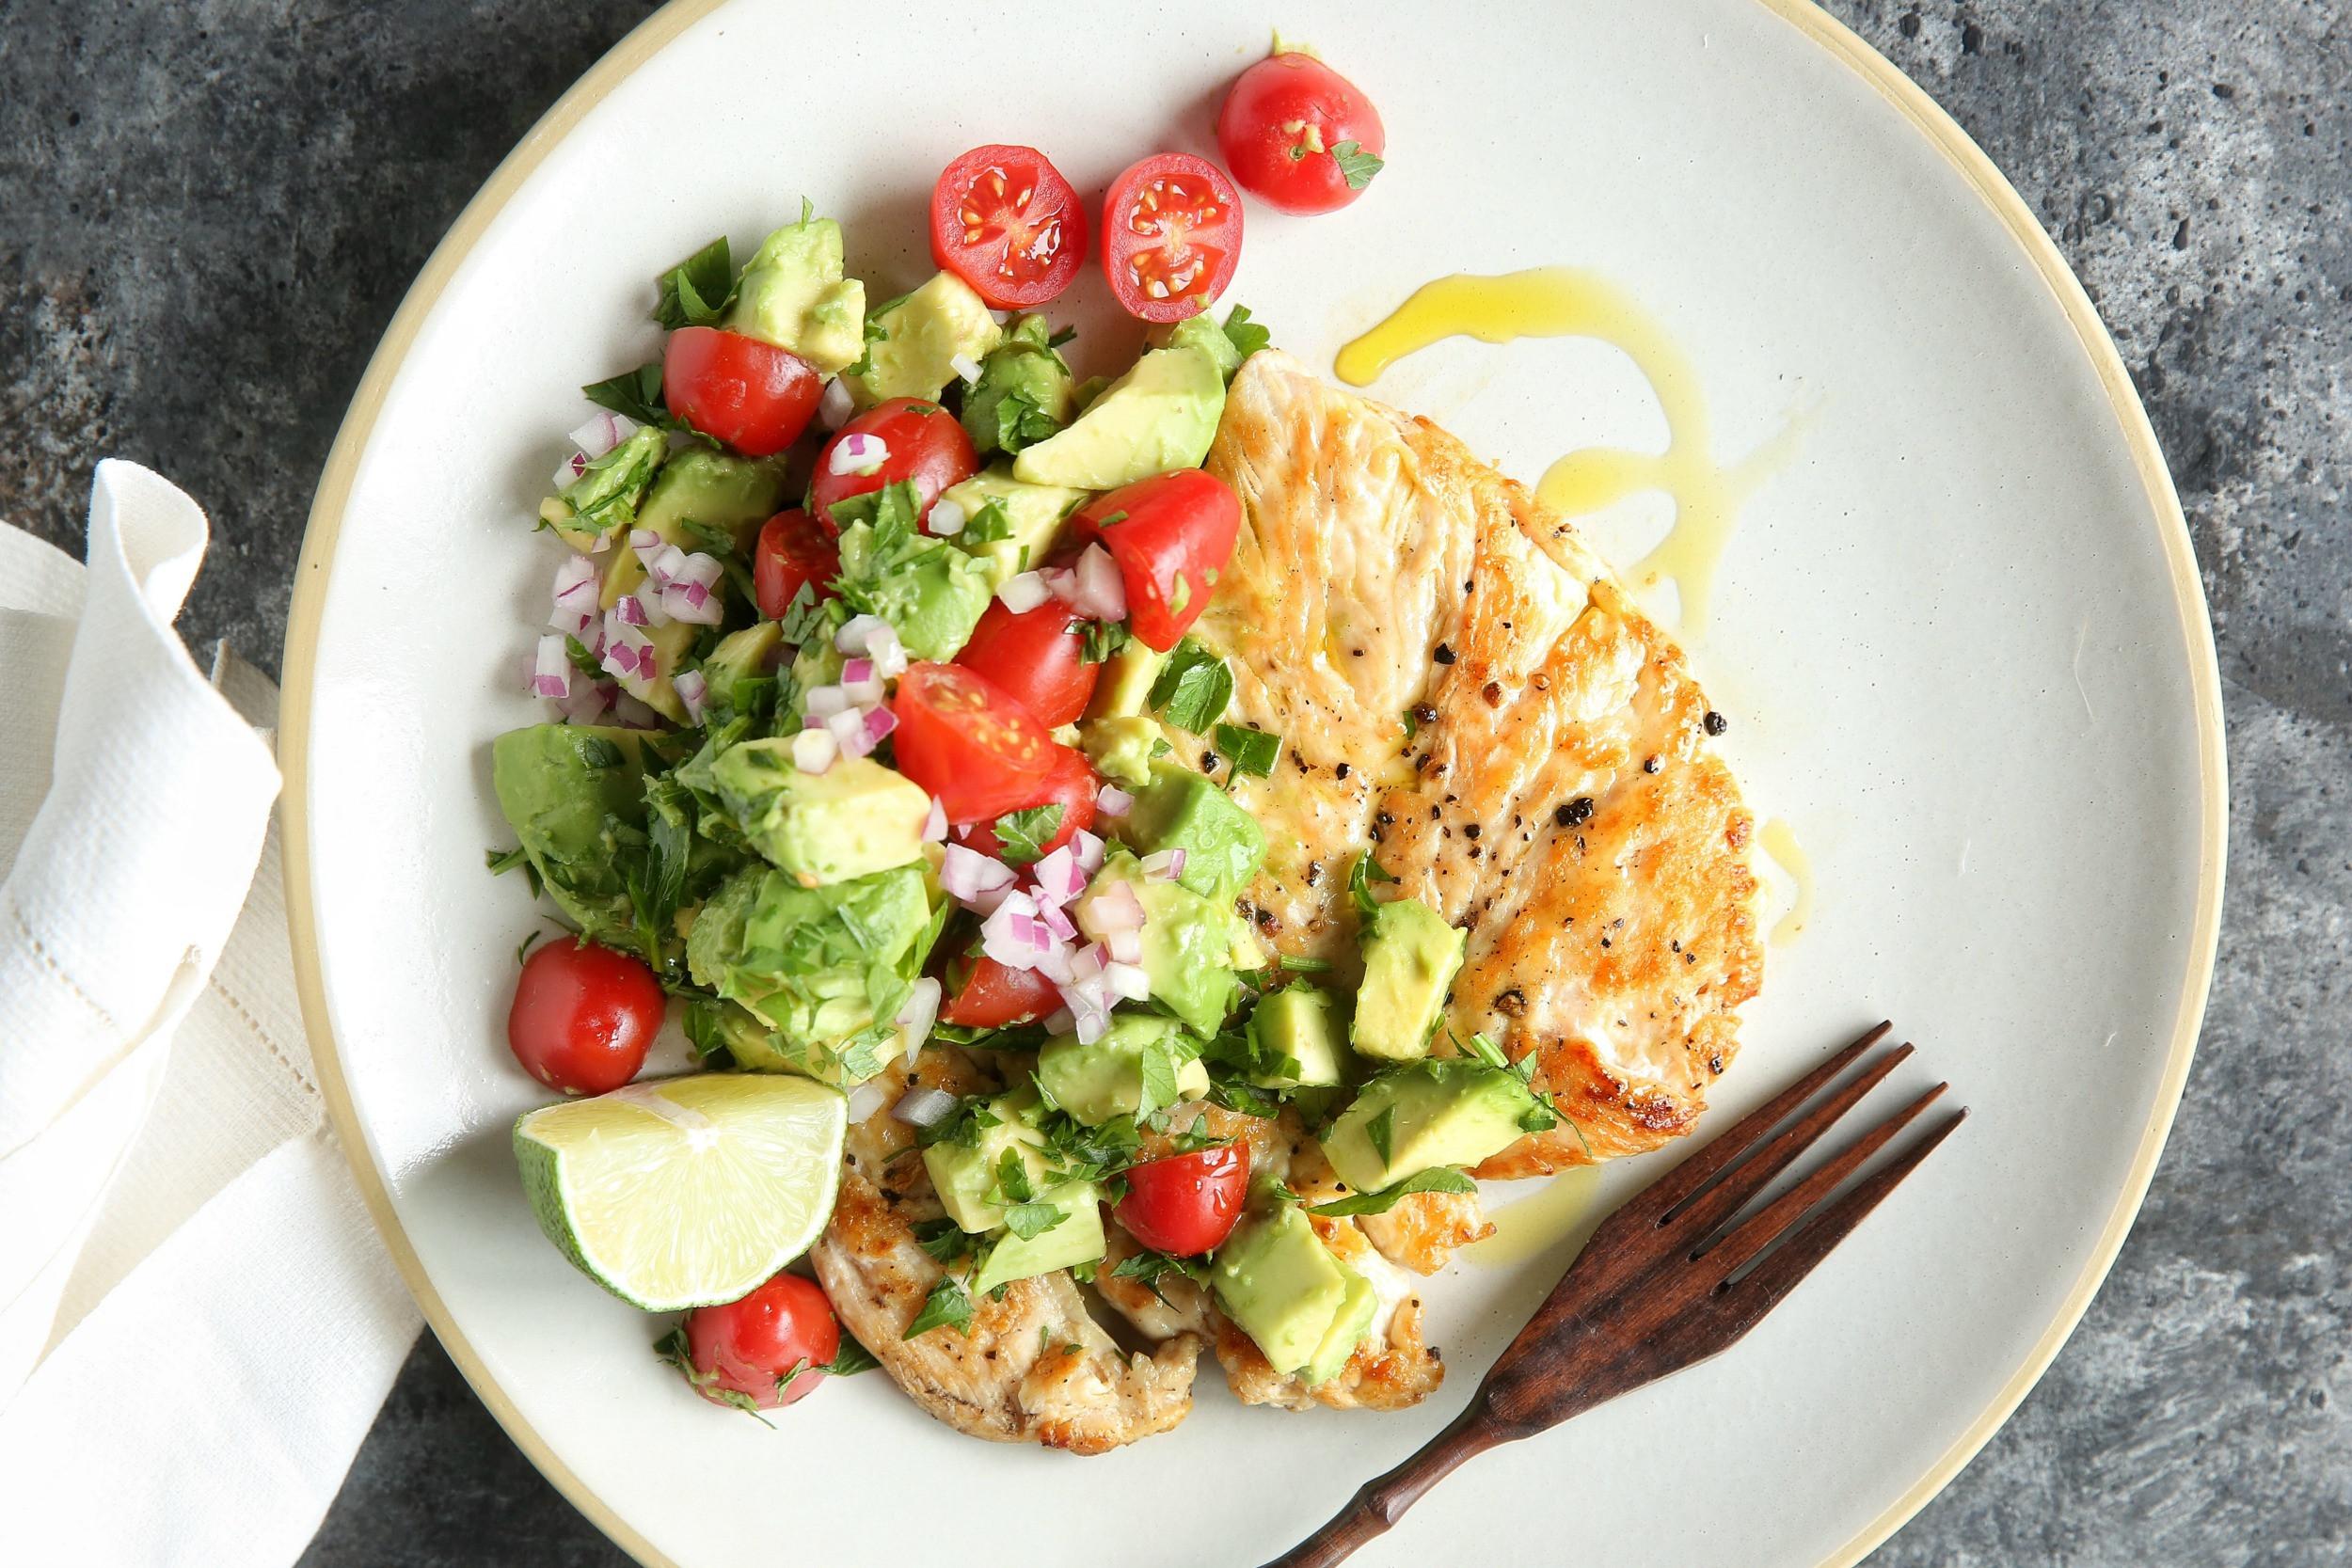 Good Summer Dinners Recipes  Easy Summer Dinner Recipes Best Ideas for Summer Family